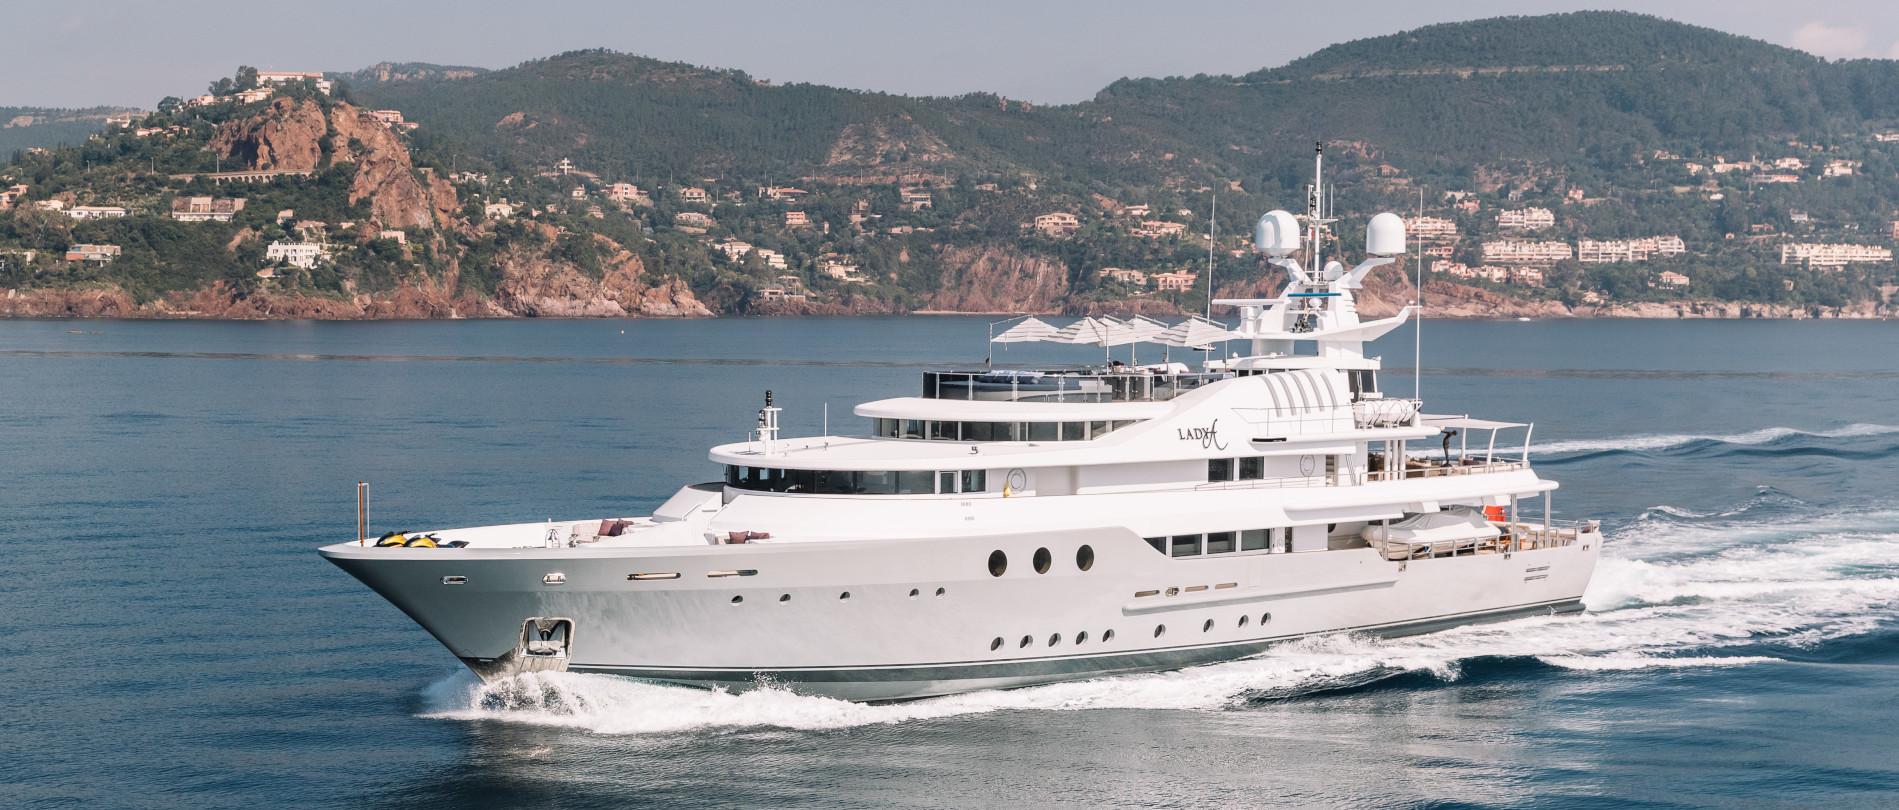 Motor yacht Southern Cross 3